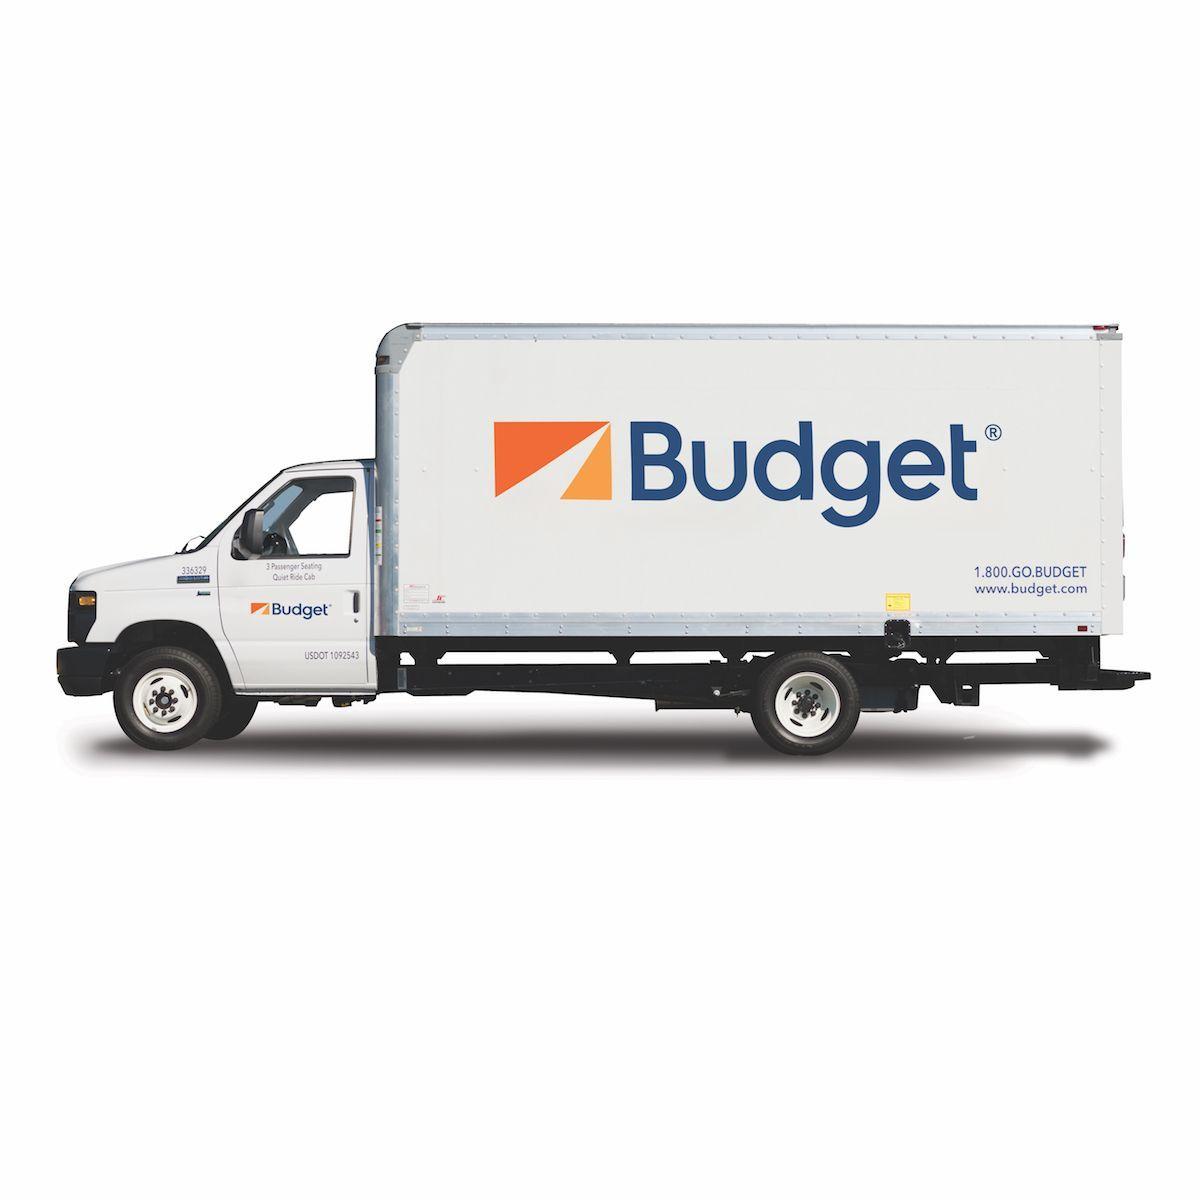 Truck Rental Price The Truck Rental Price squintyeyed